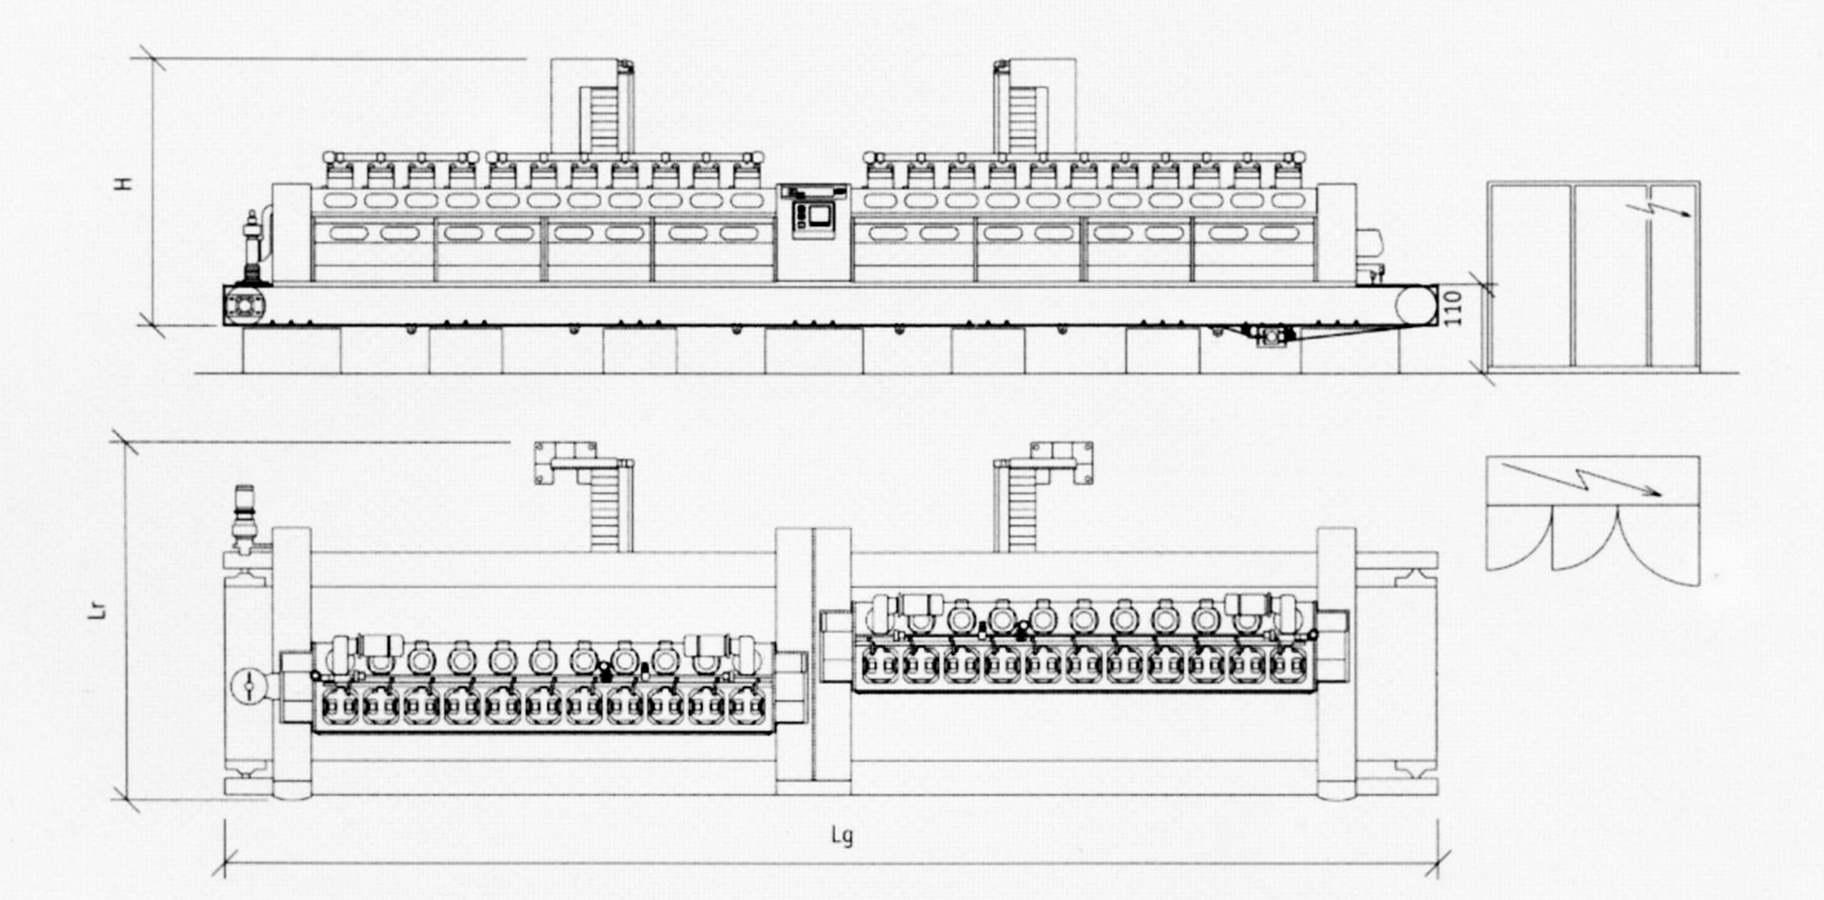 KLGM 220 Macchina Lucidatrice schema struttura interna